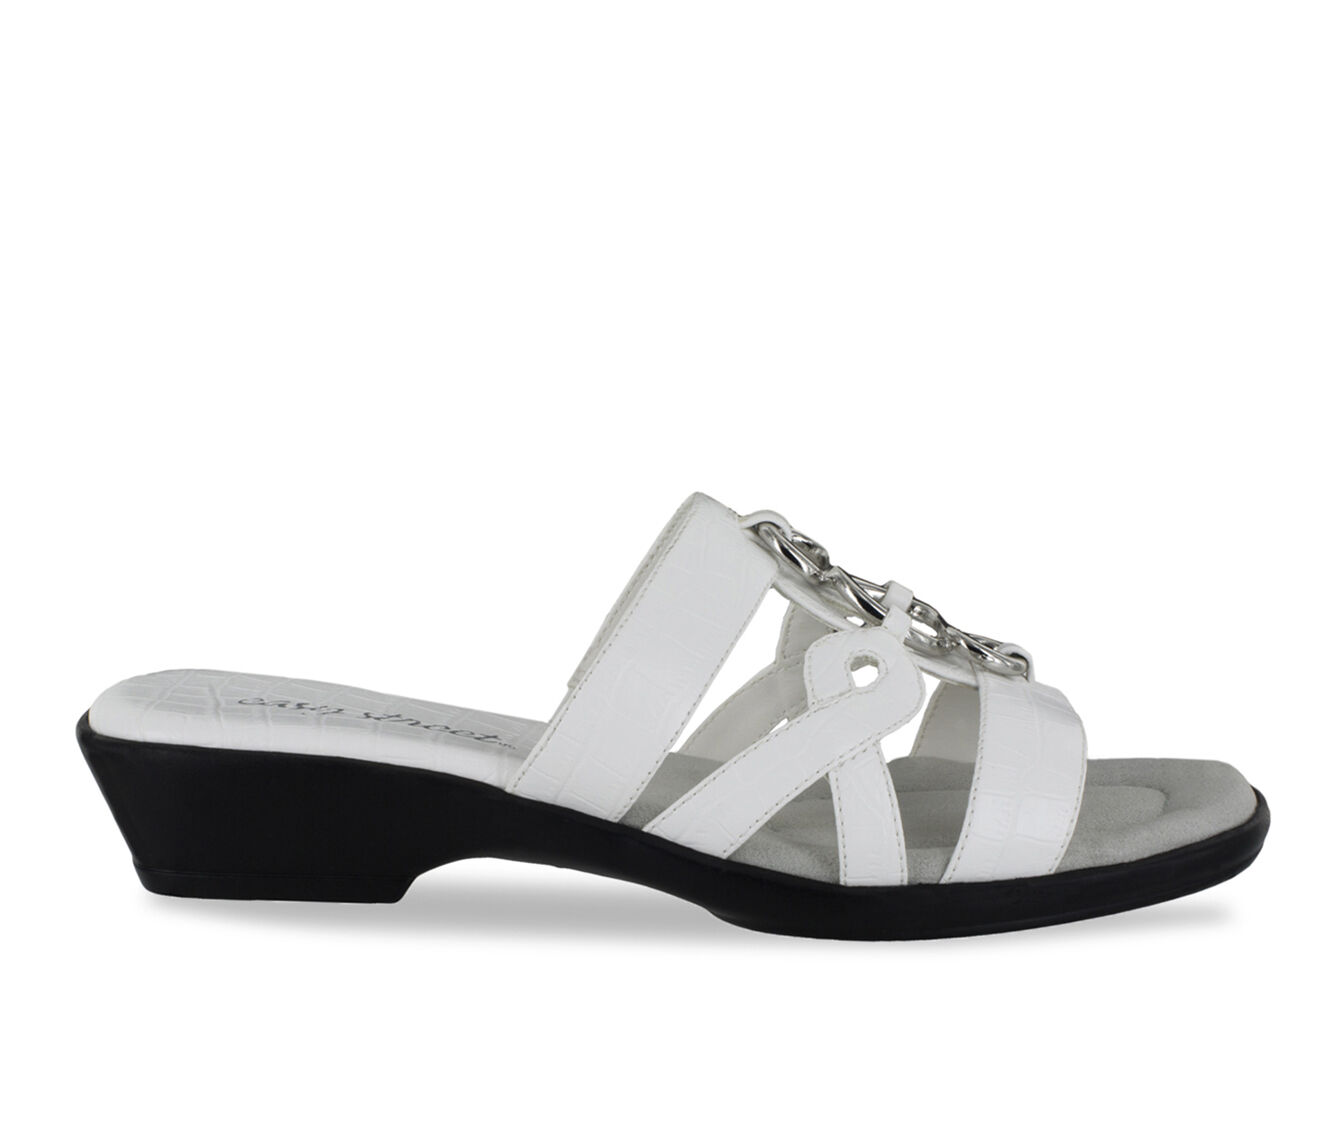 uk shoes_kd5762